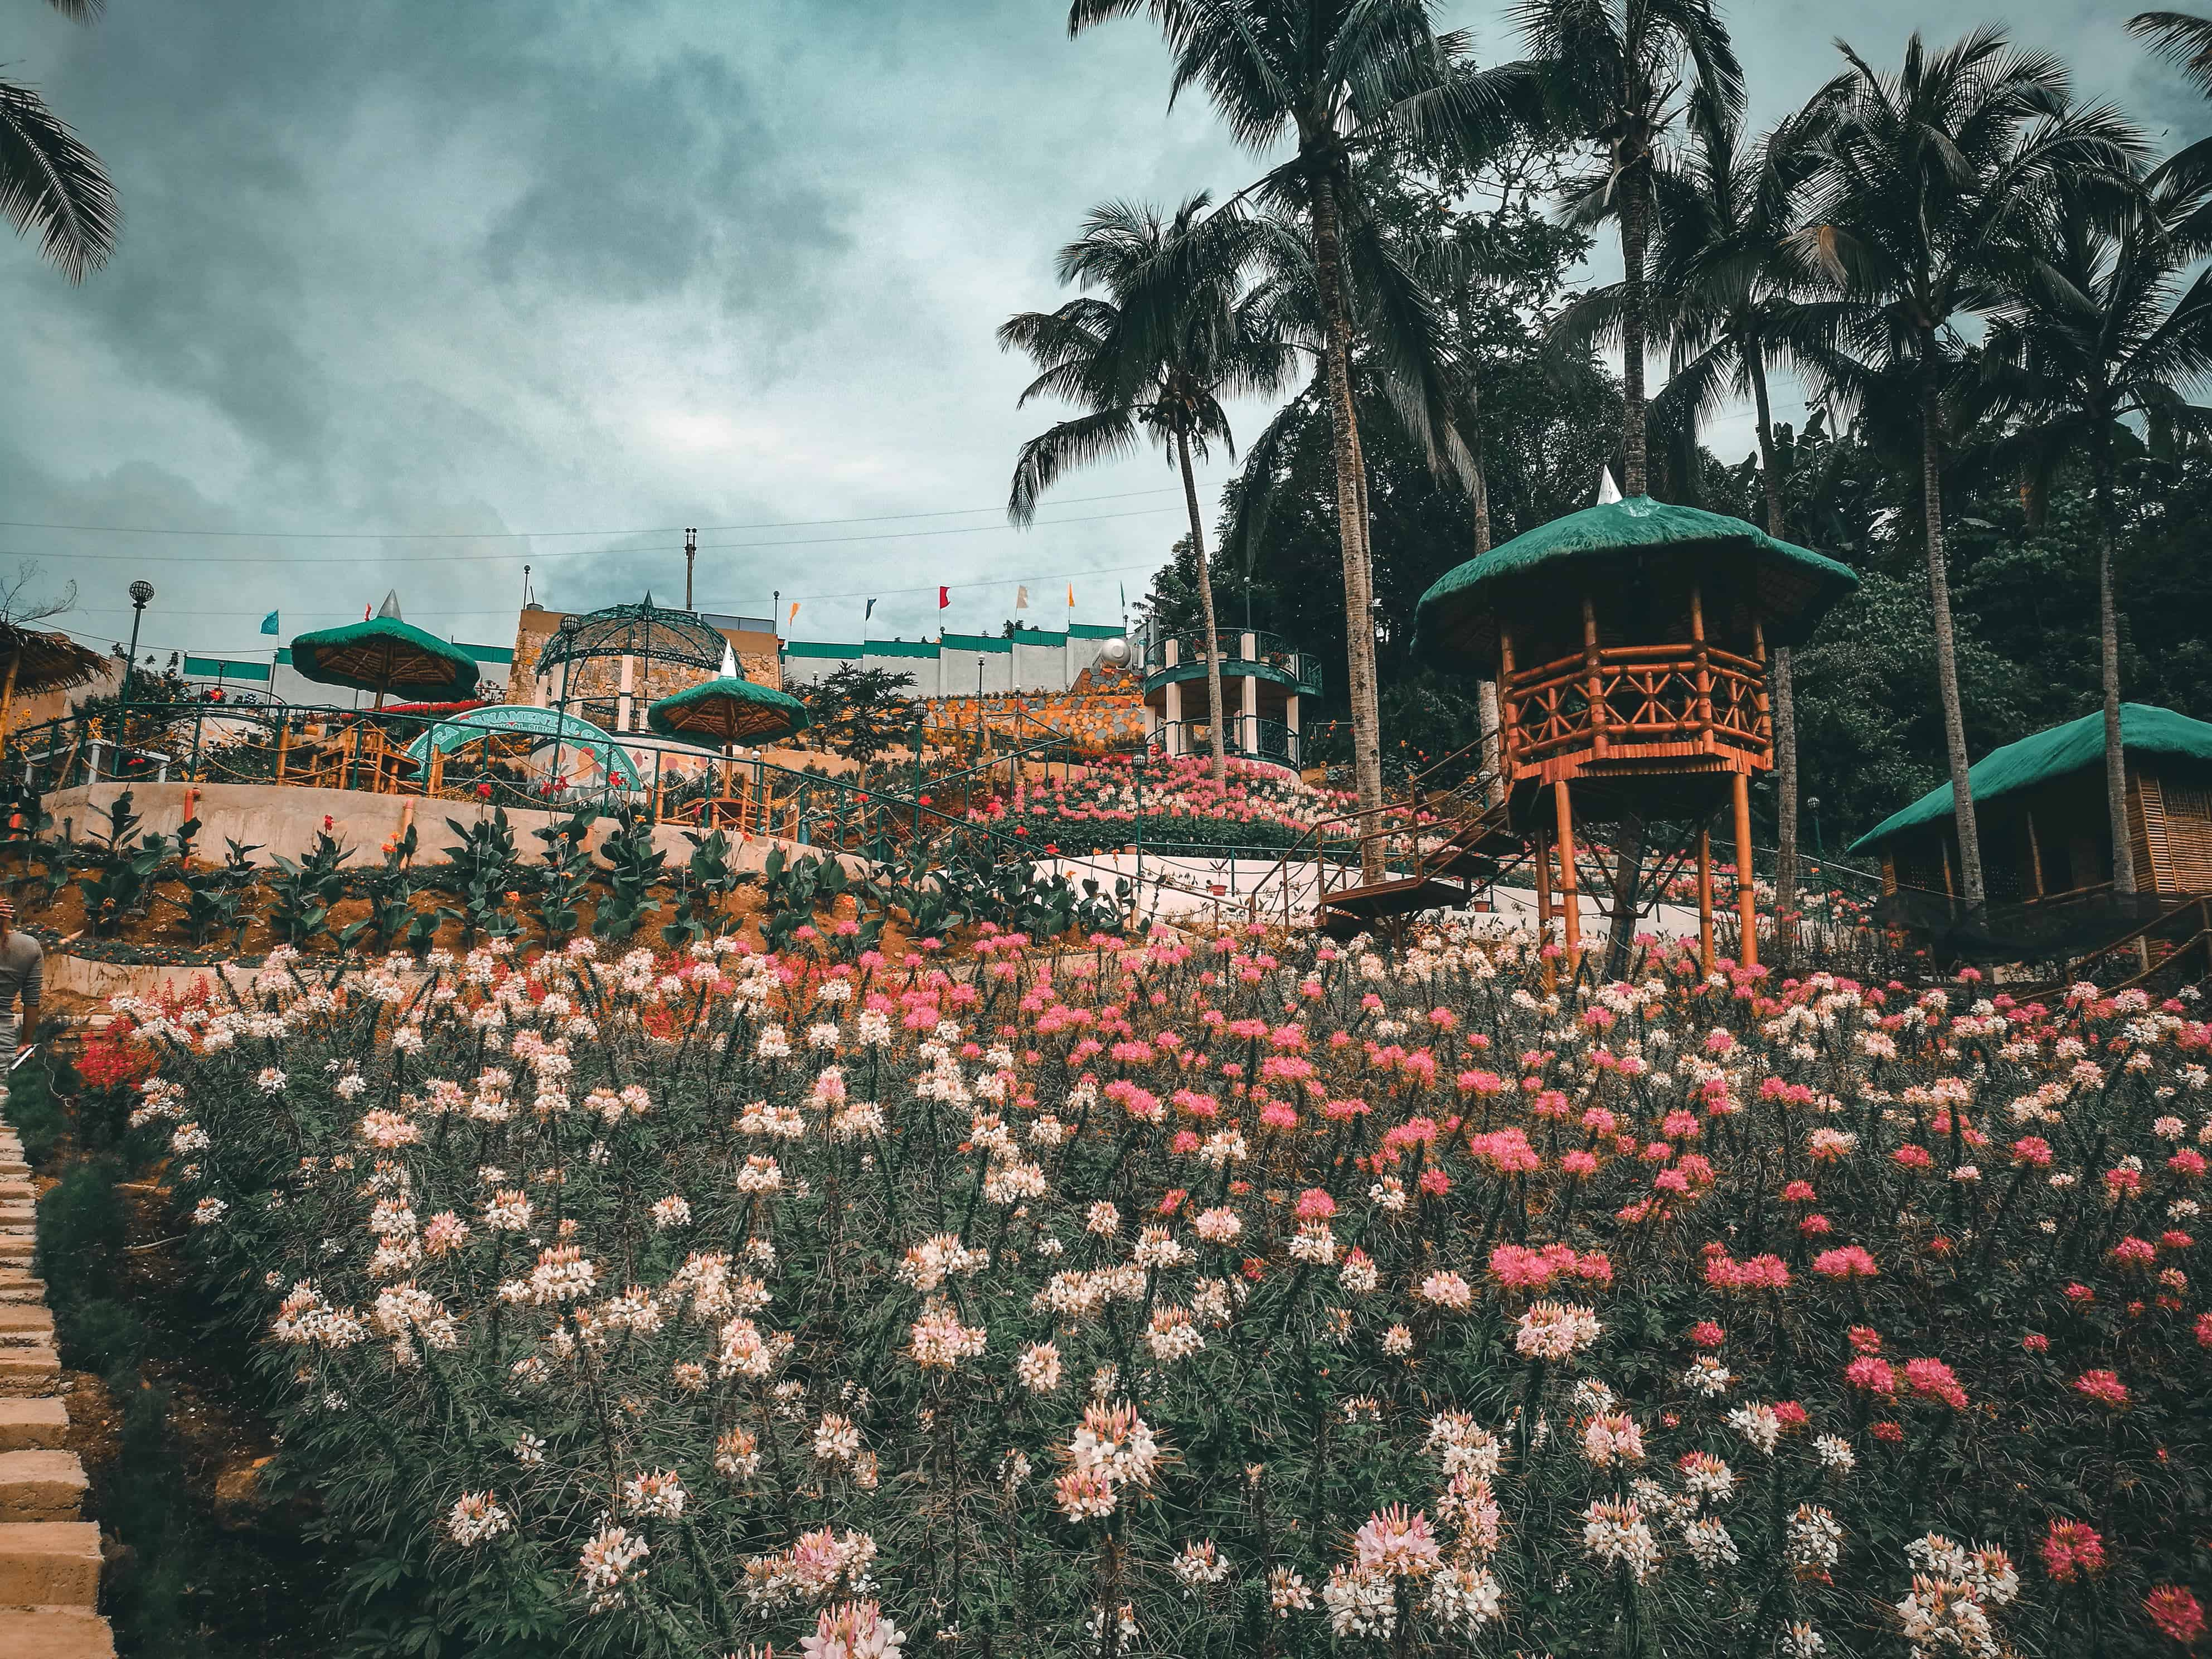 MSDEA Ornamental Garden Cebu City (1)